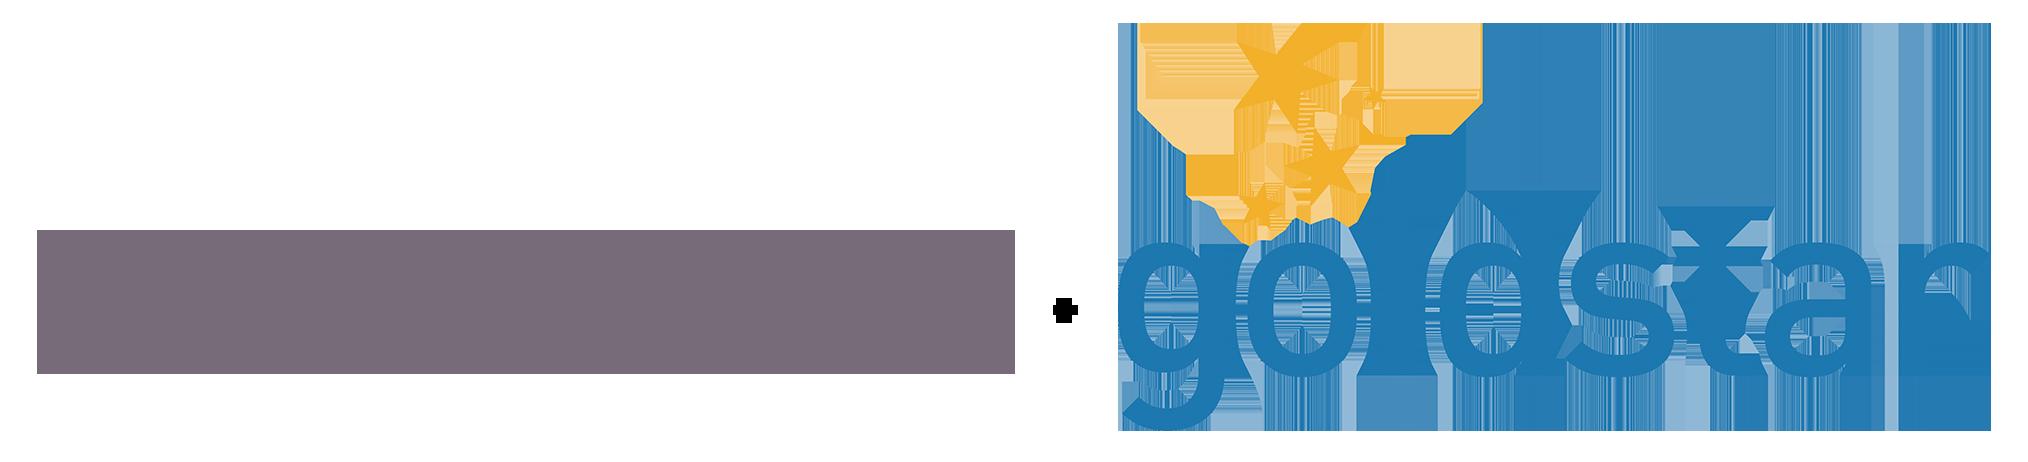 giveawaylogo.png